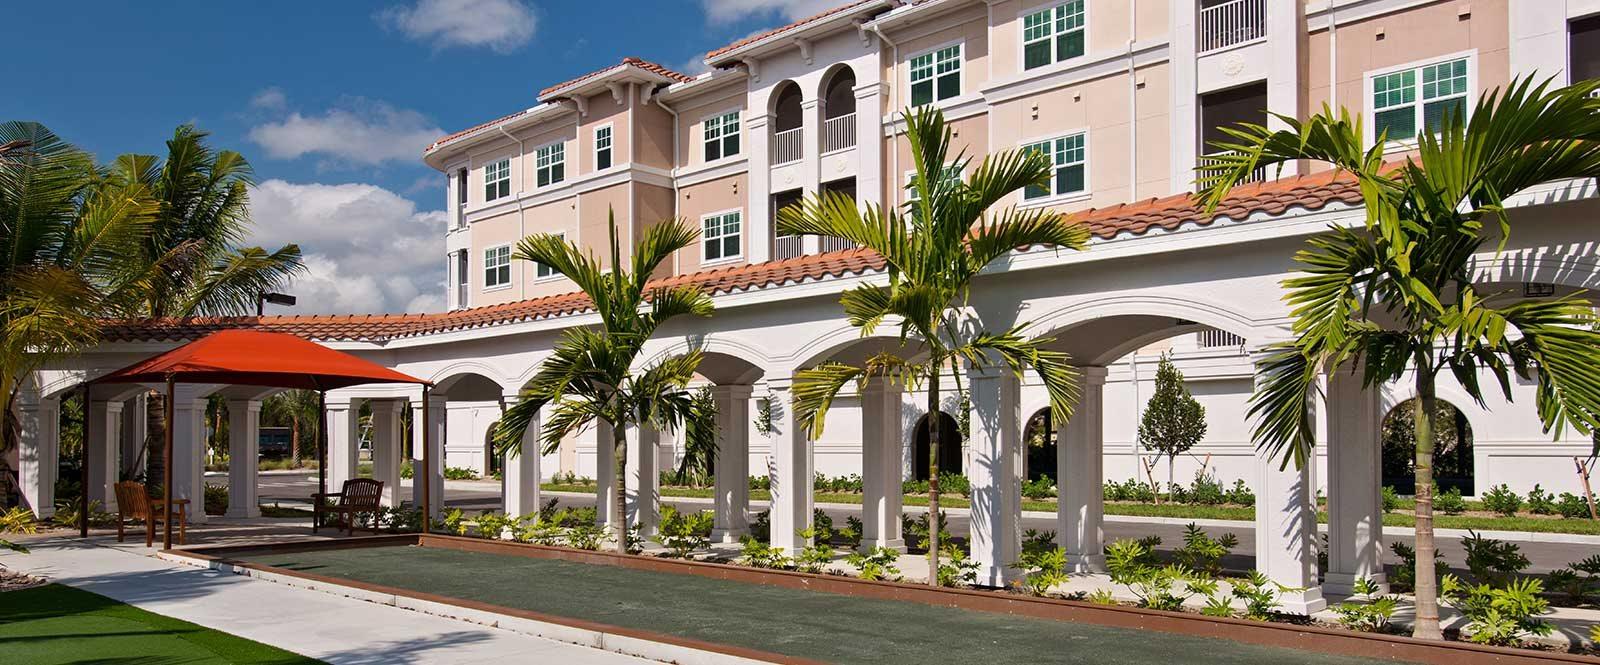 Diamond Oaks Village Apartments In Bonita Springs Fl